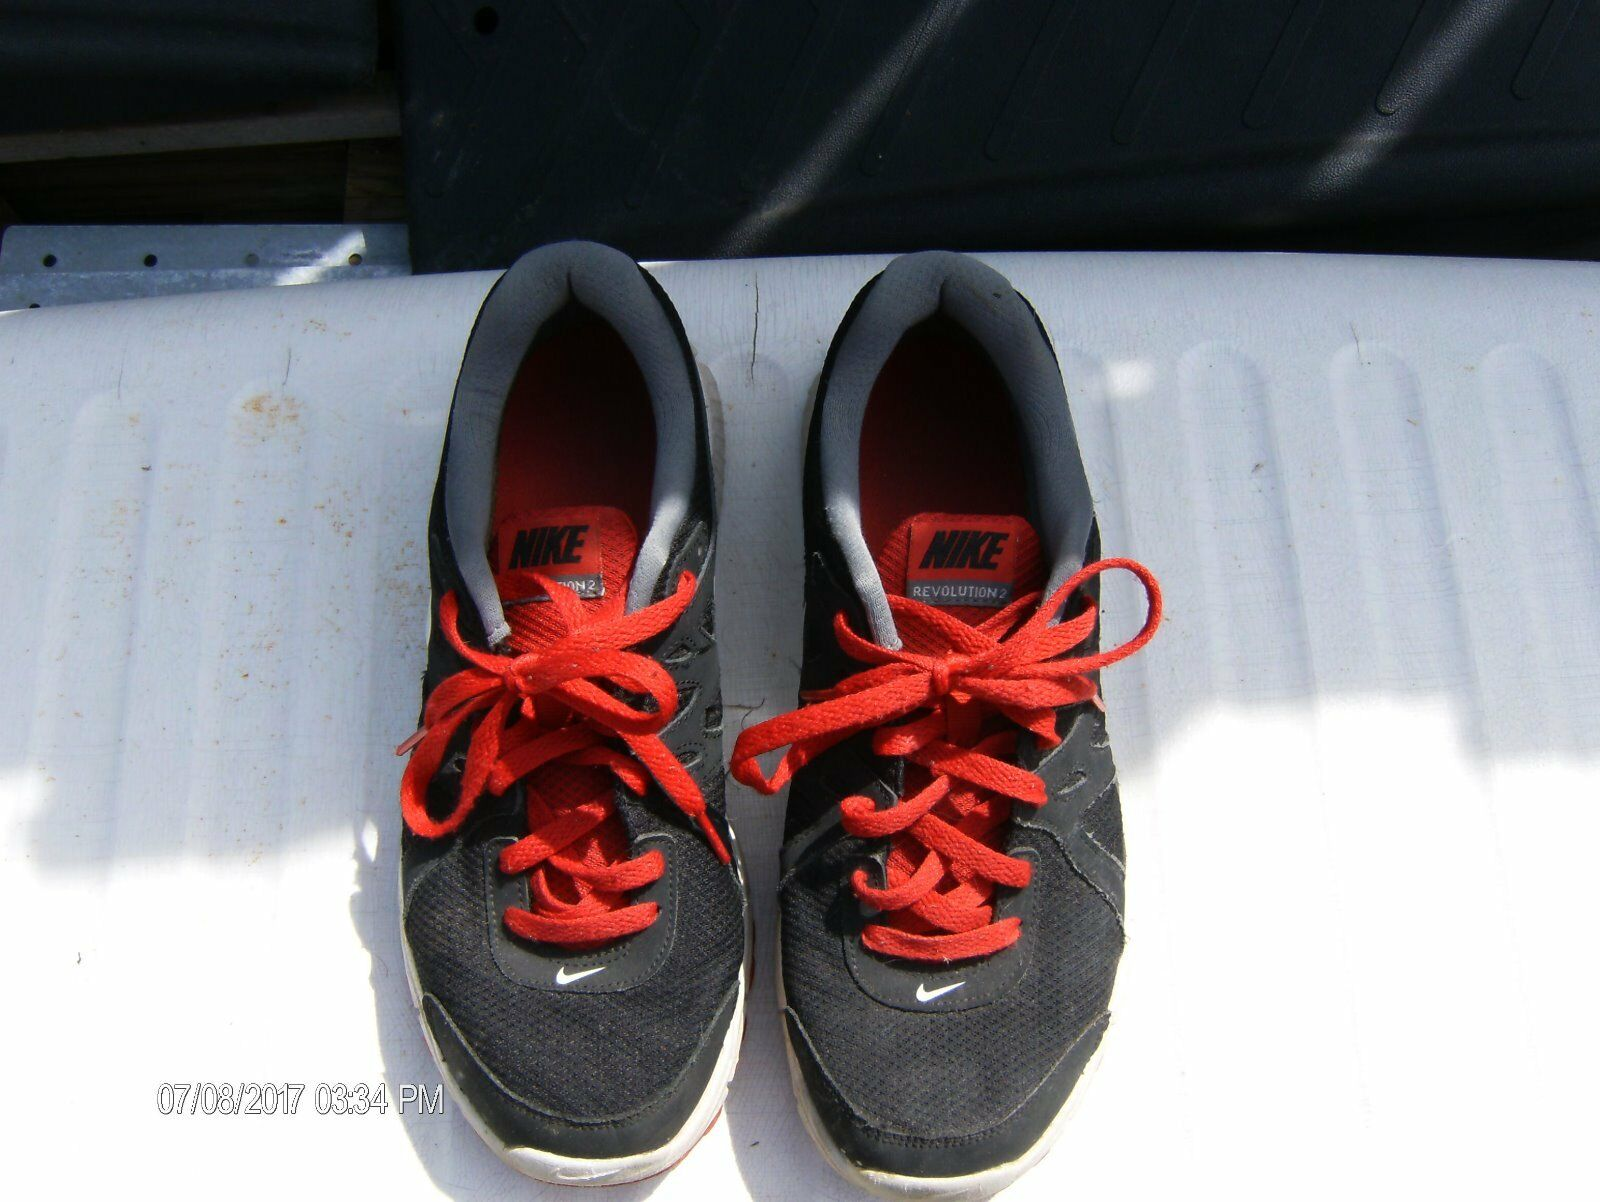 Hombre Nike Size REVOLUTION 2 Athletic Shoes Size Nike 9 barato y hermoso moda e95aaa